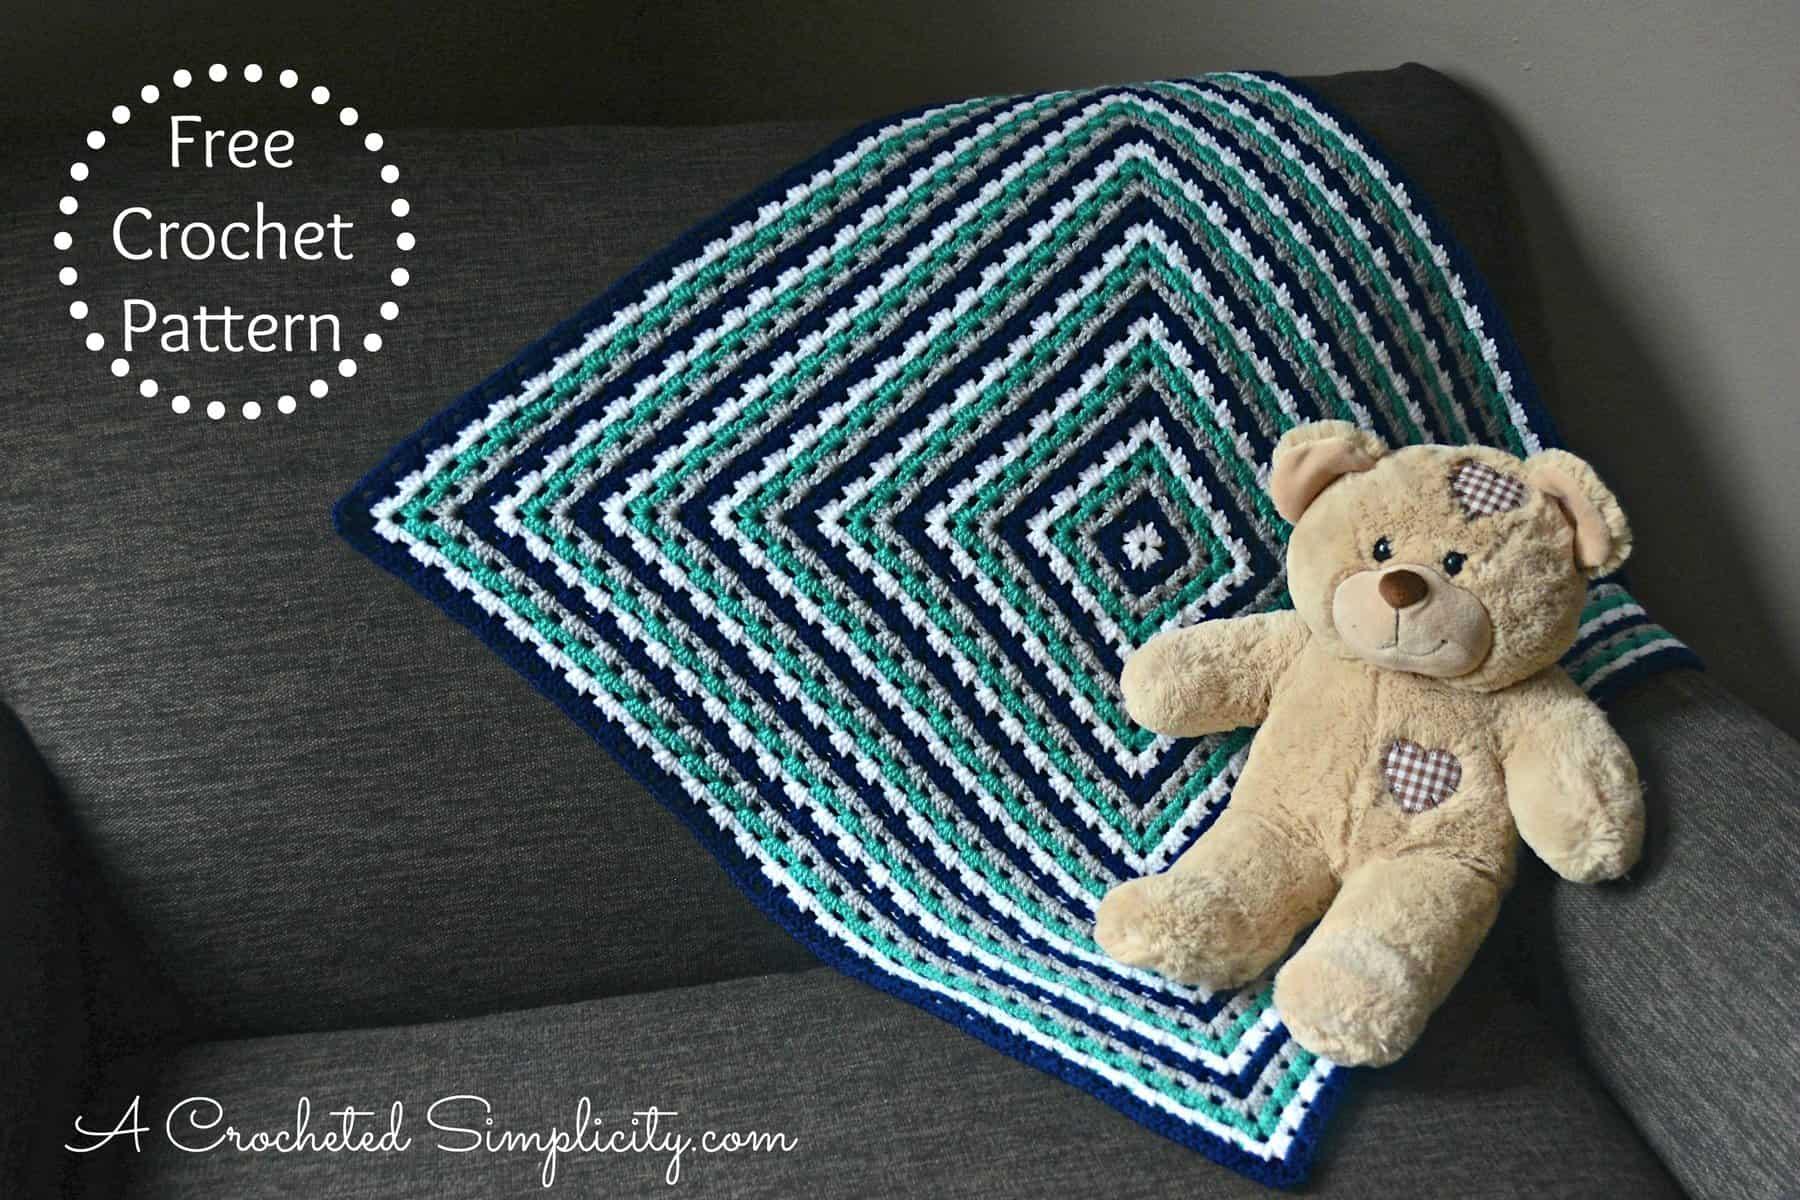 Free Crochet Pattern Get In Line Granny Afghan Video Tutorial